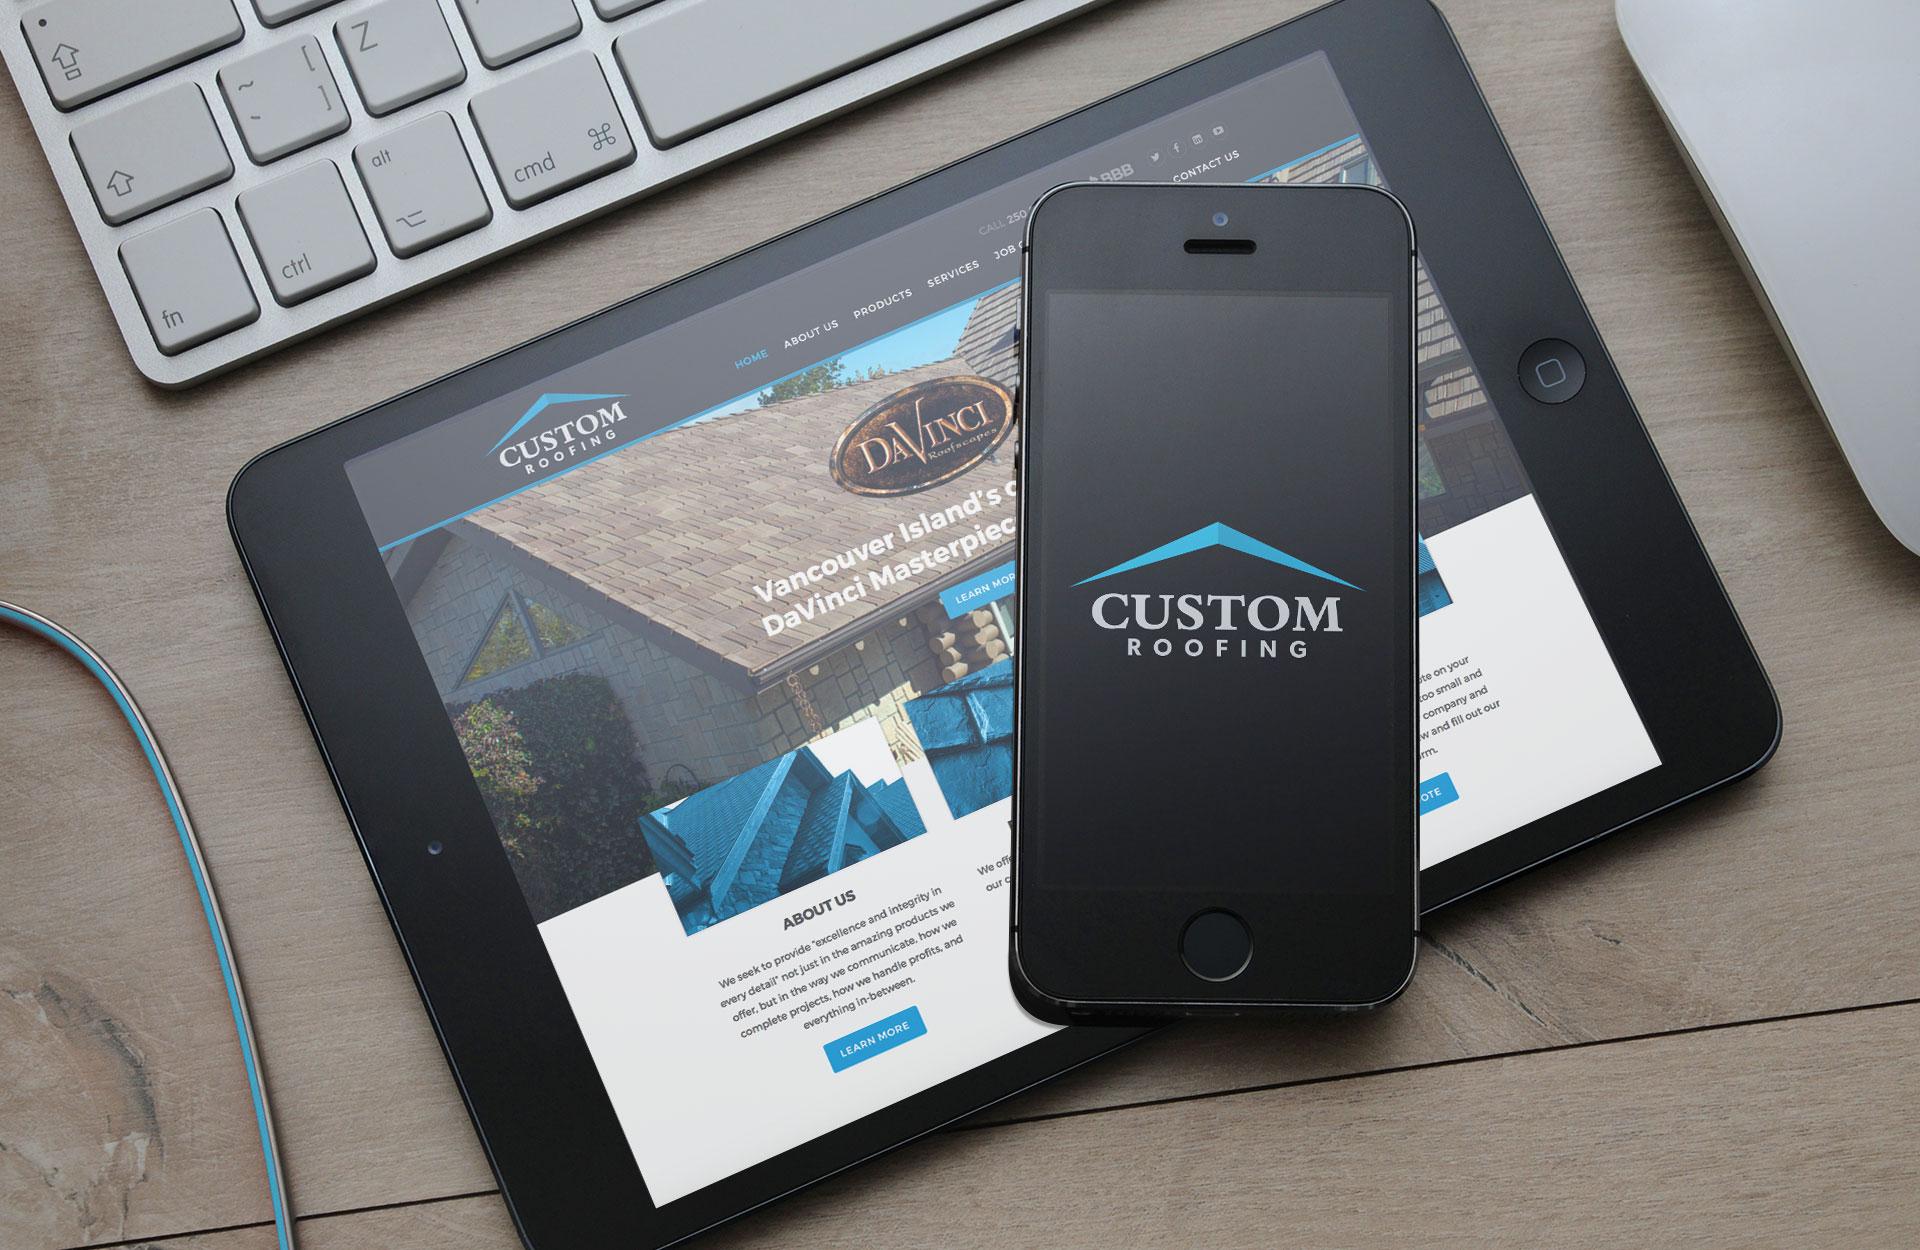 48north-customroofing-website-mockup